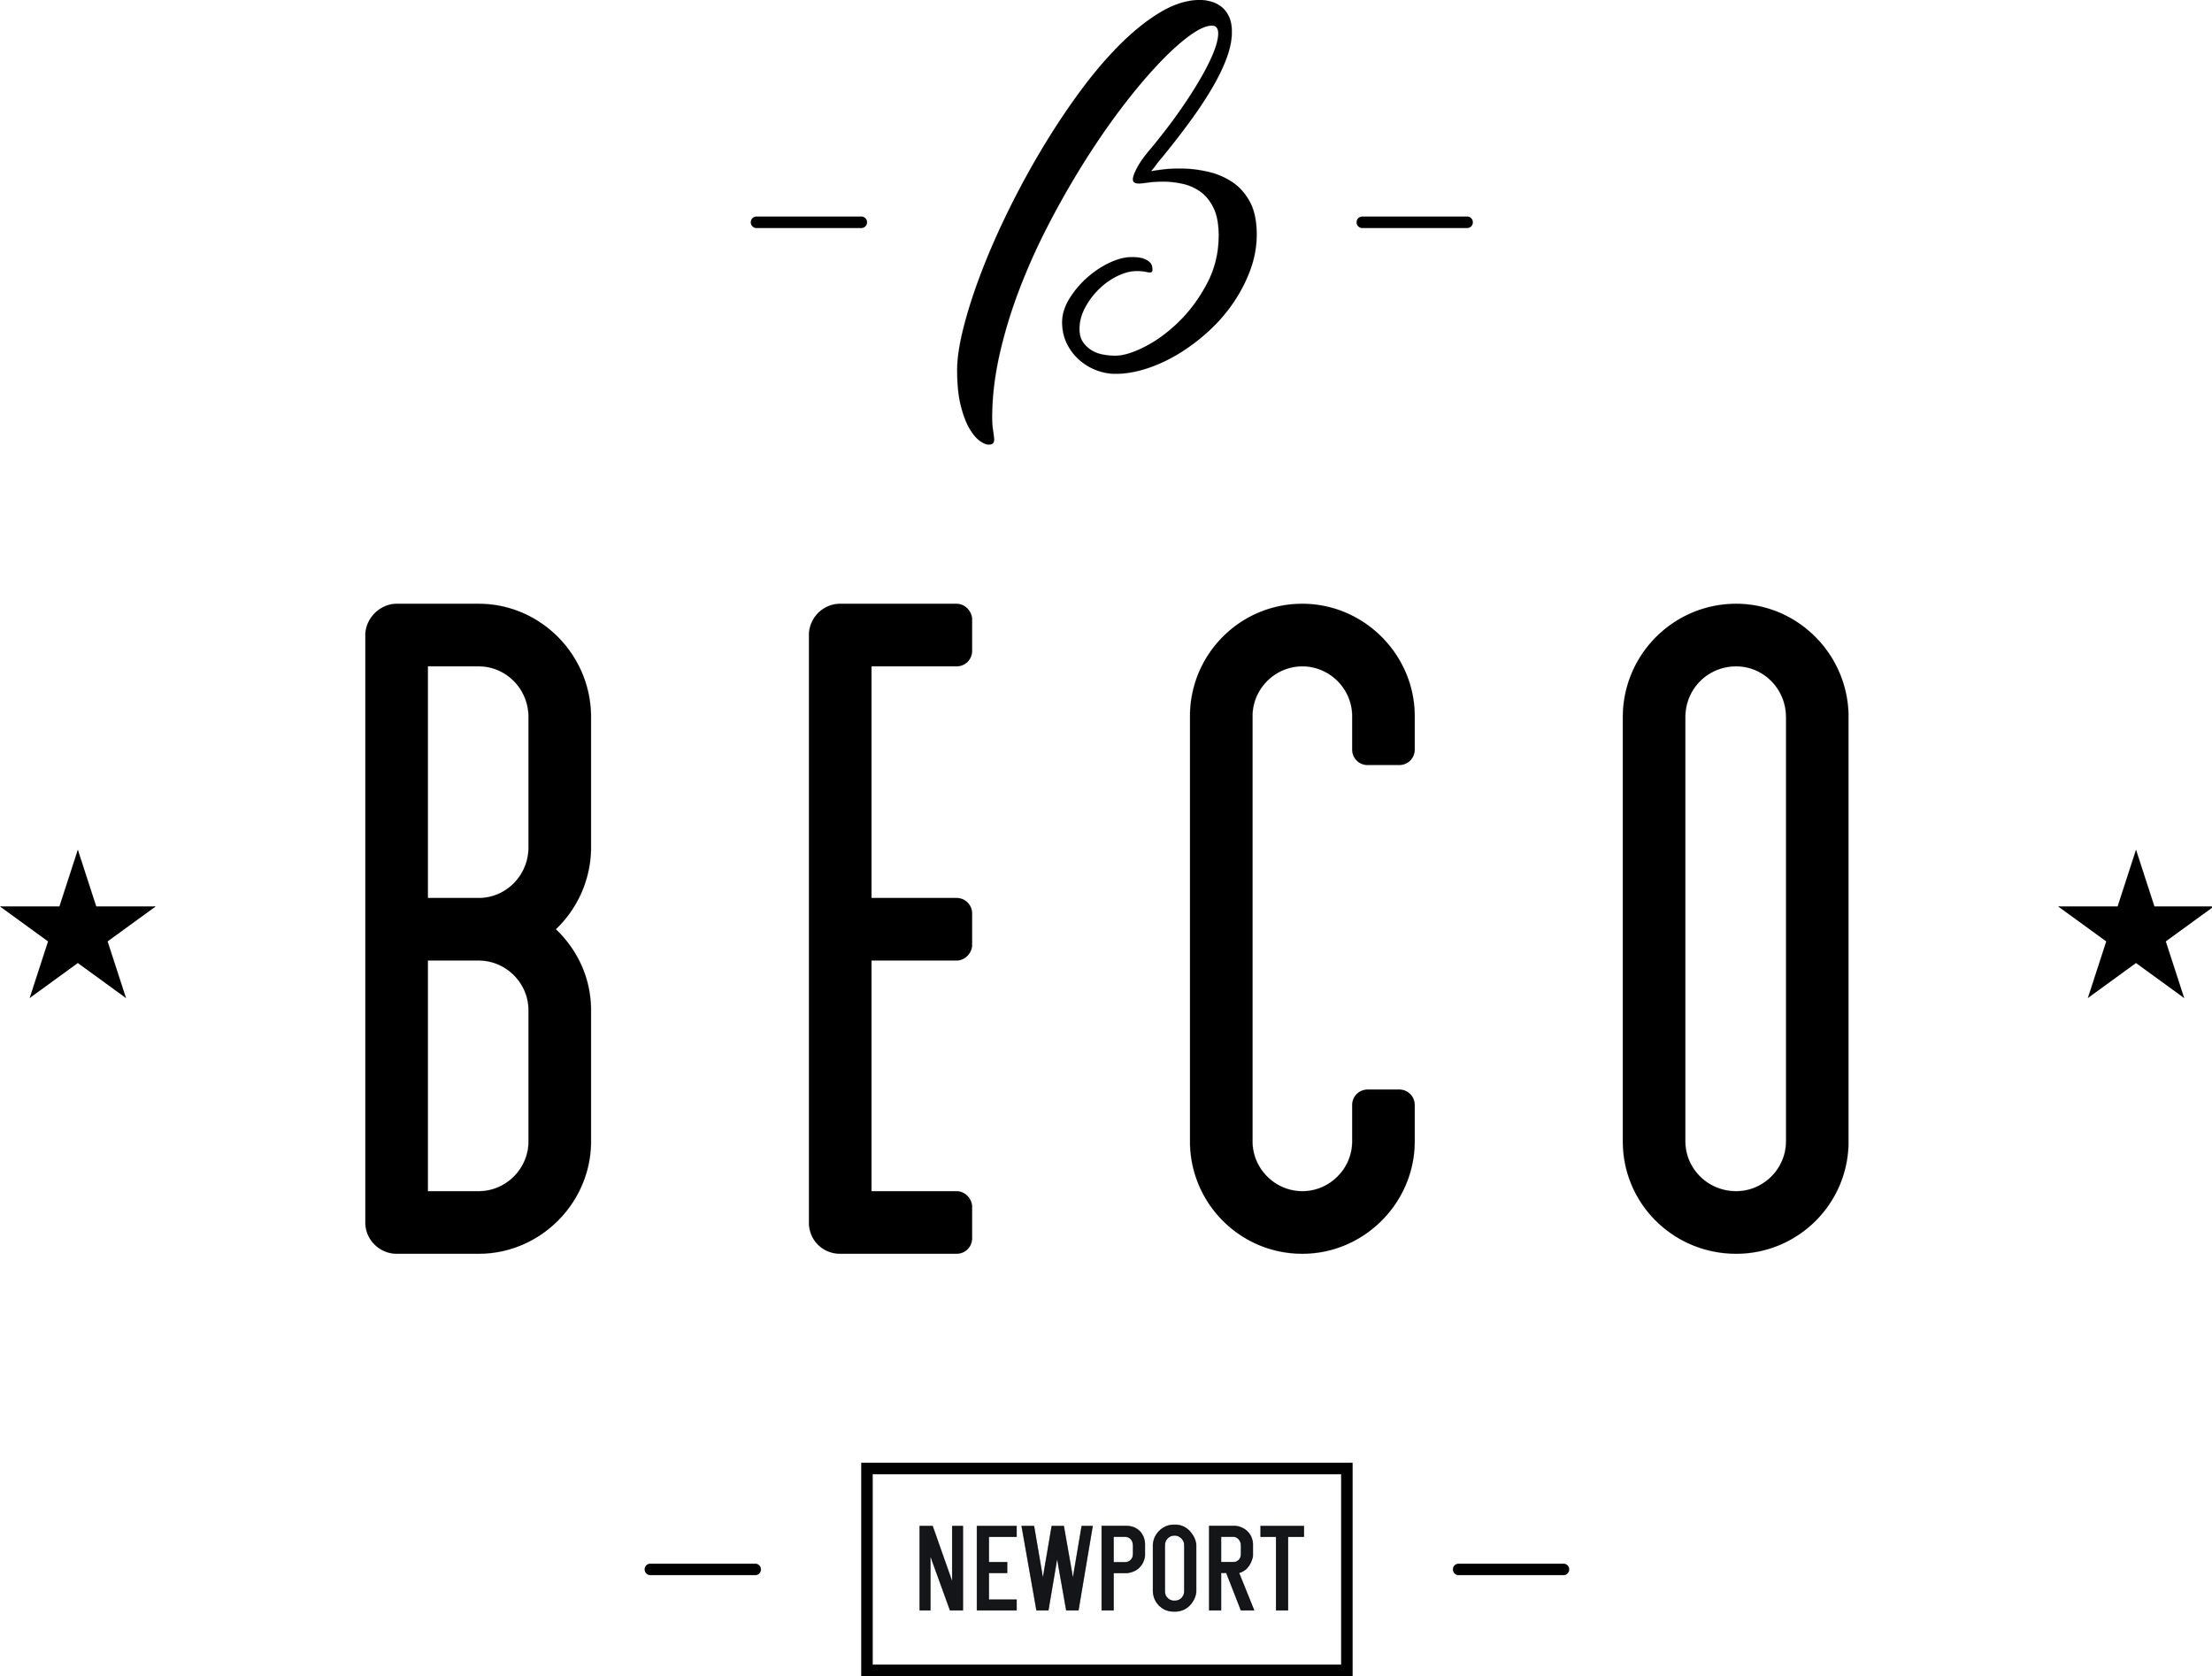 Beco_Newport_Logo.jpg